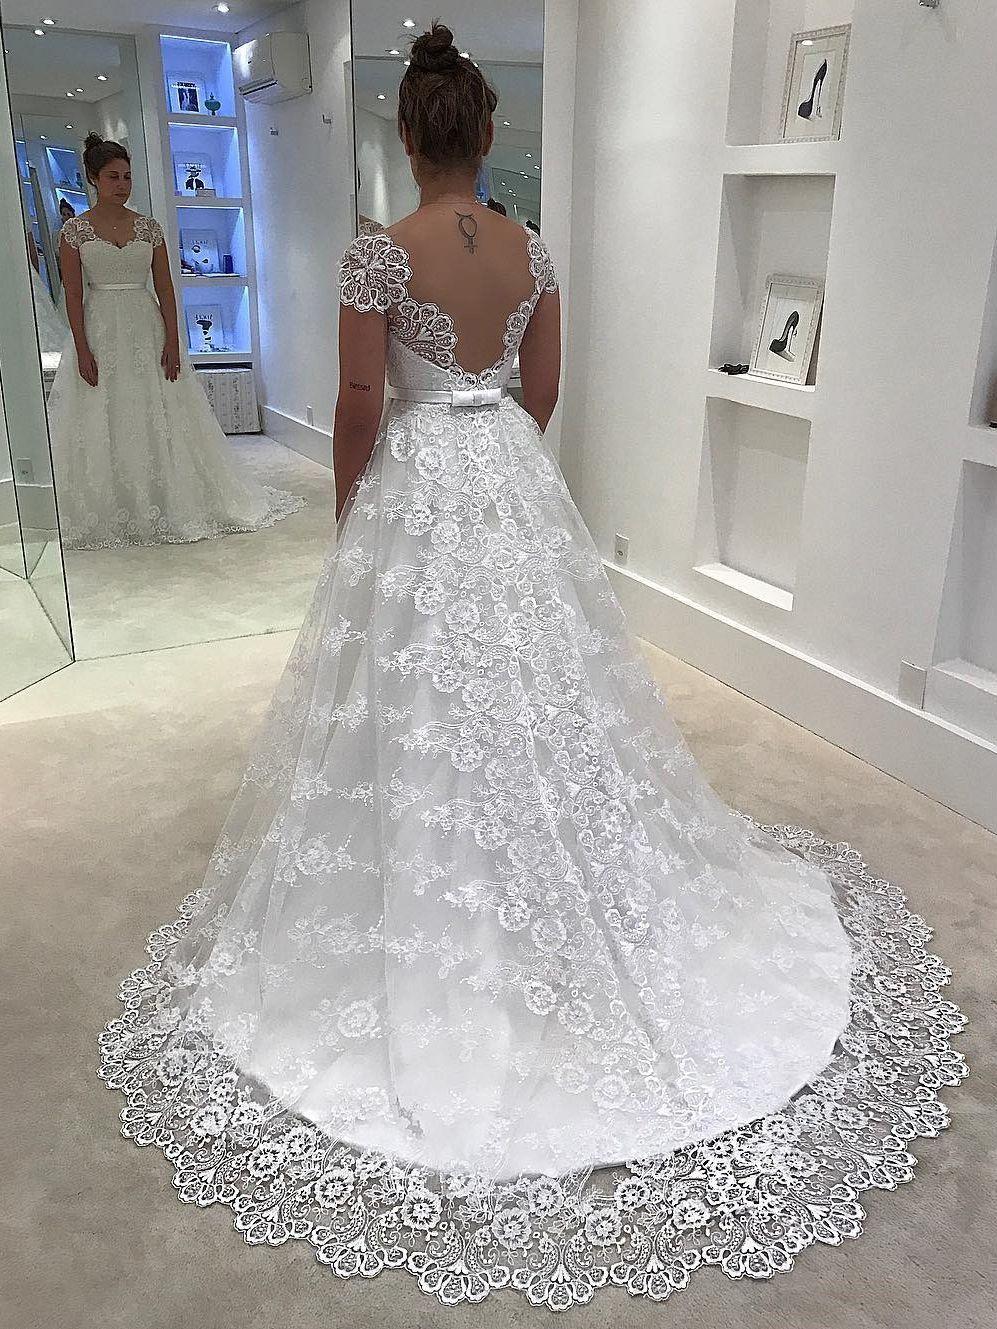 c8173fc78 Wedding Dresses 2018, Wedding Dress White, Lace Wedding Dress, Wedding Dress  2018, Long Wedding Dress, Lace White Wedding Dress #Wedding #Dresses #2018  ...